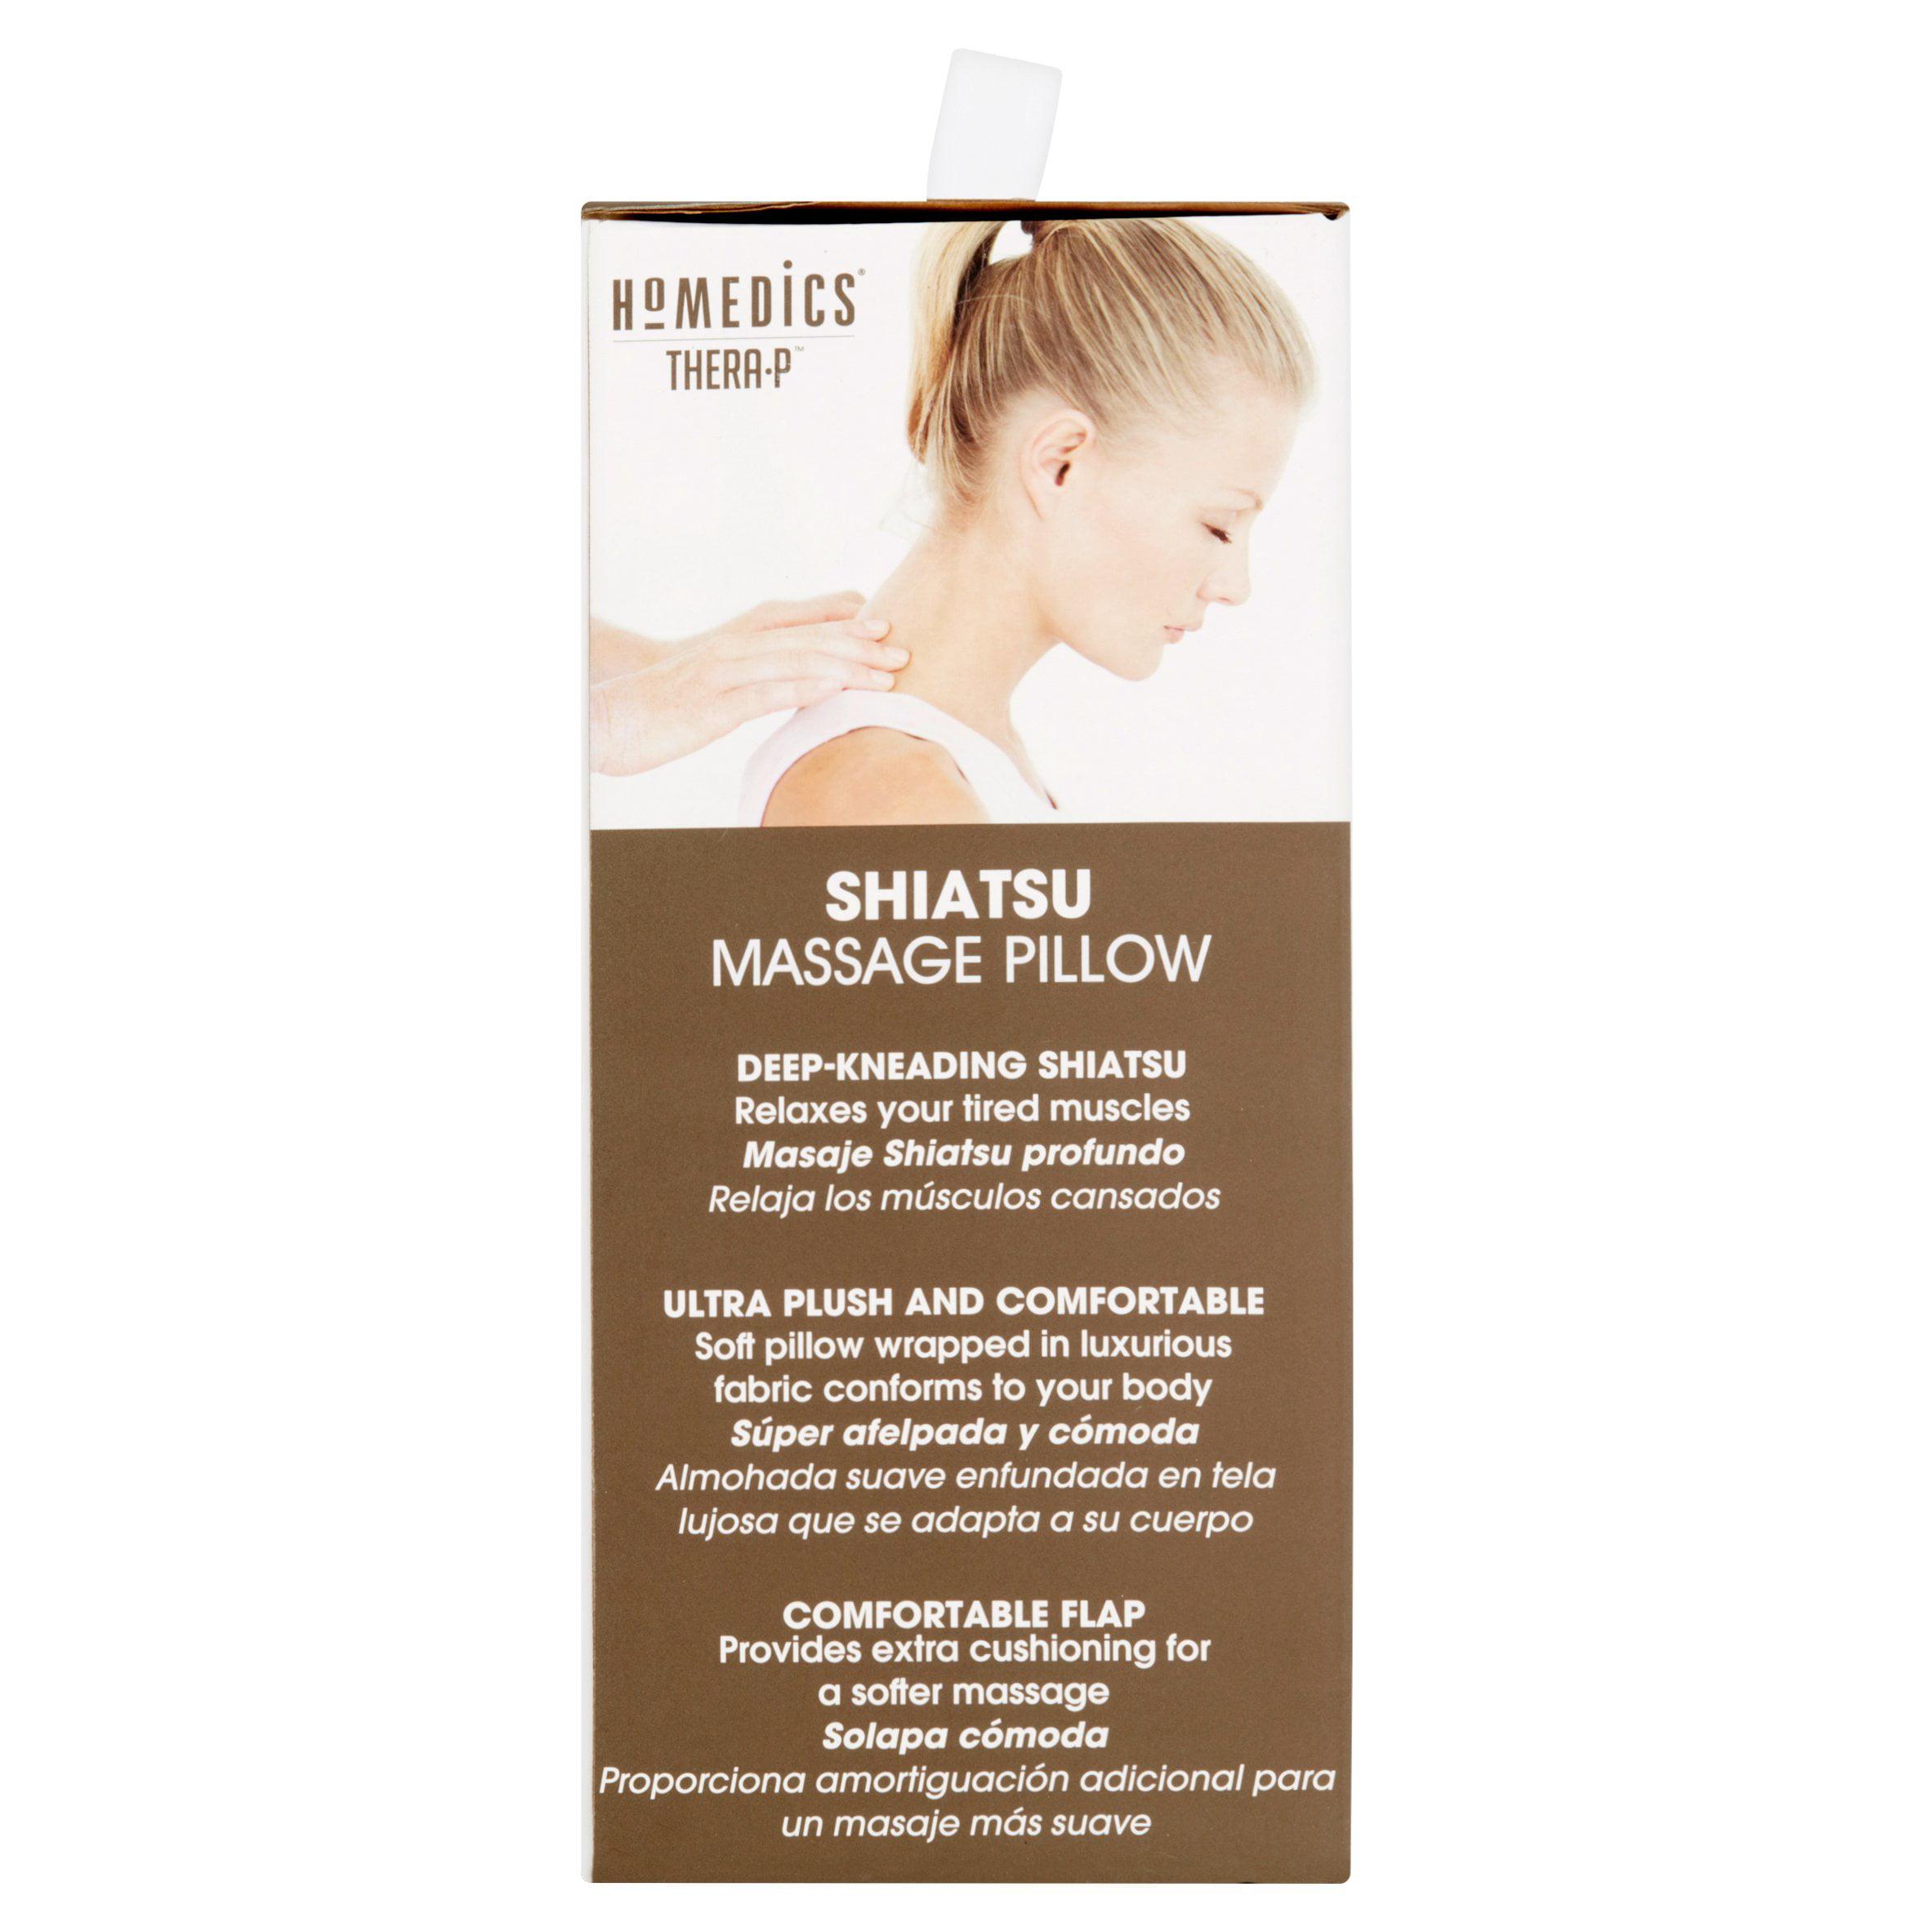 HoMedics Shiatsu Massage Pillow Walmart